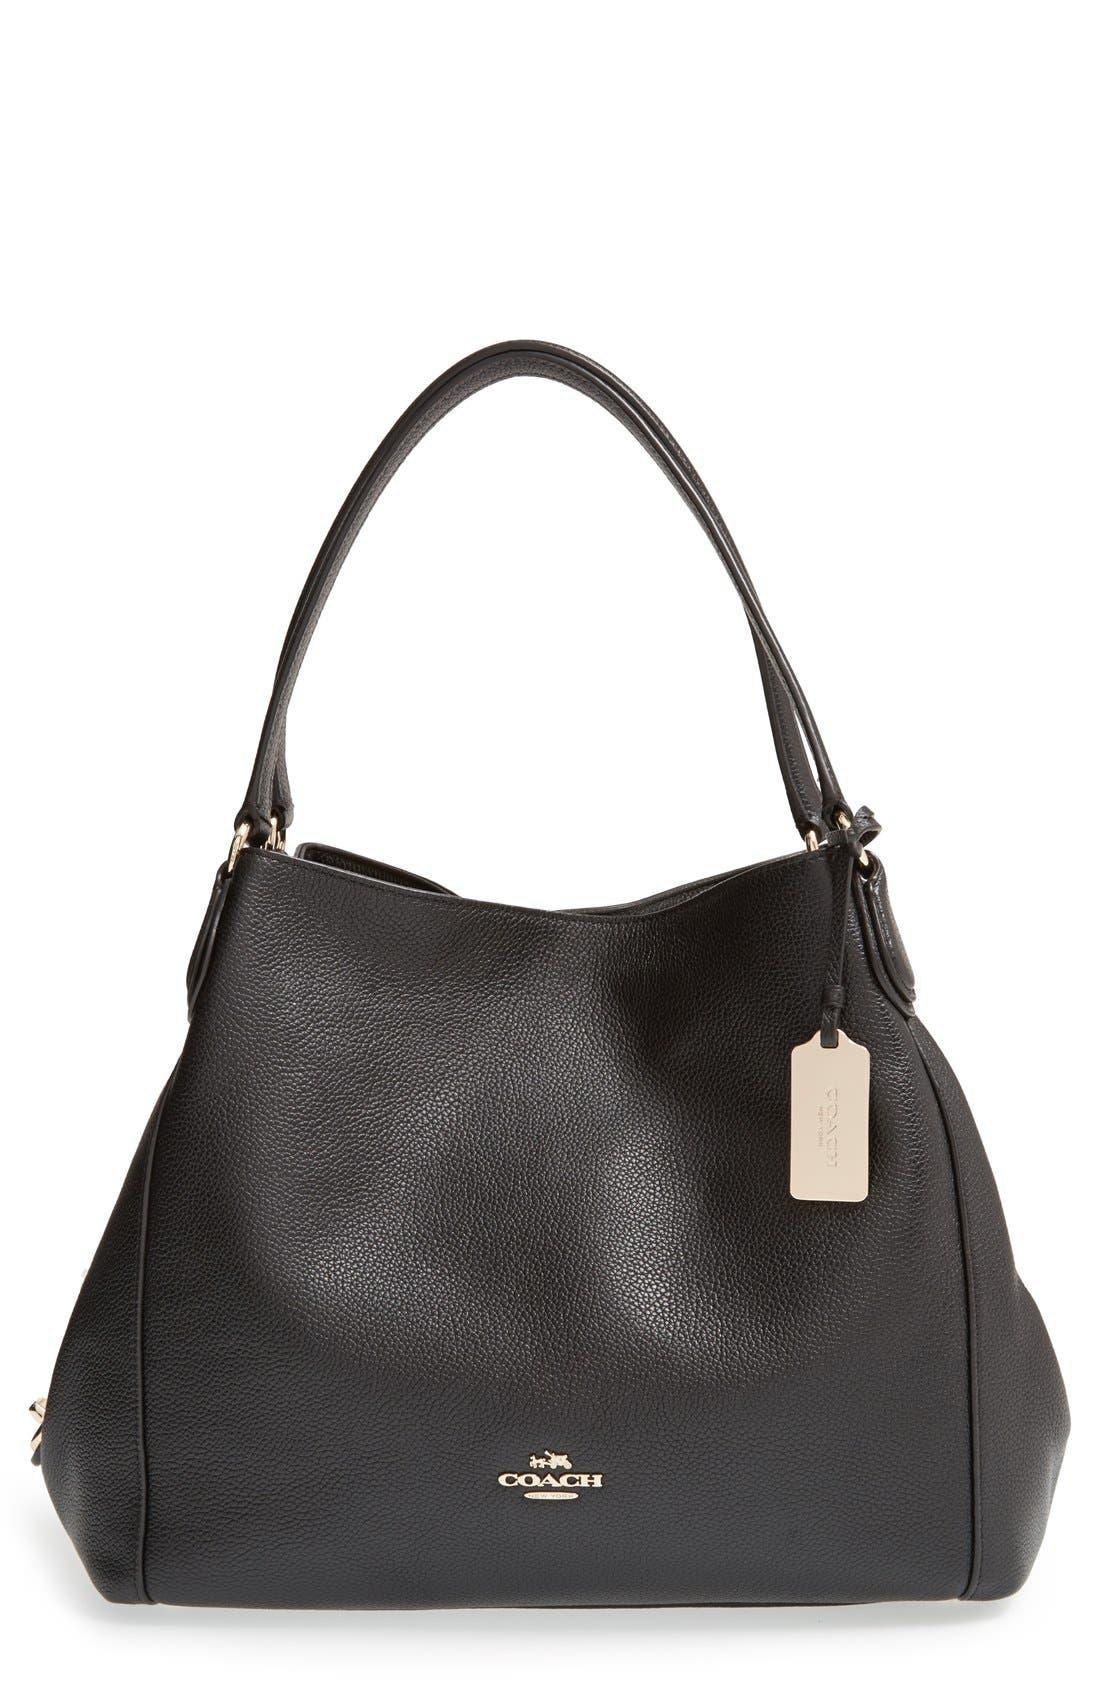 Main Image - Coach 'Edie' Pebbled Leather Shoulder Bag